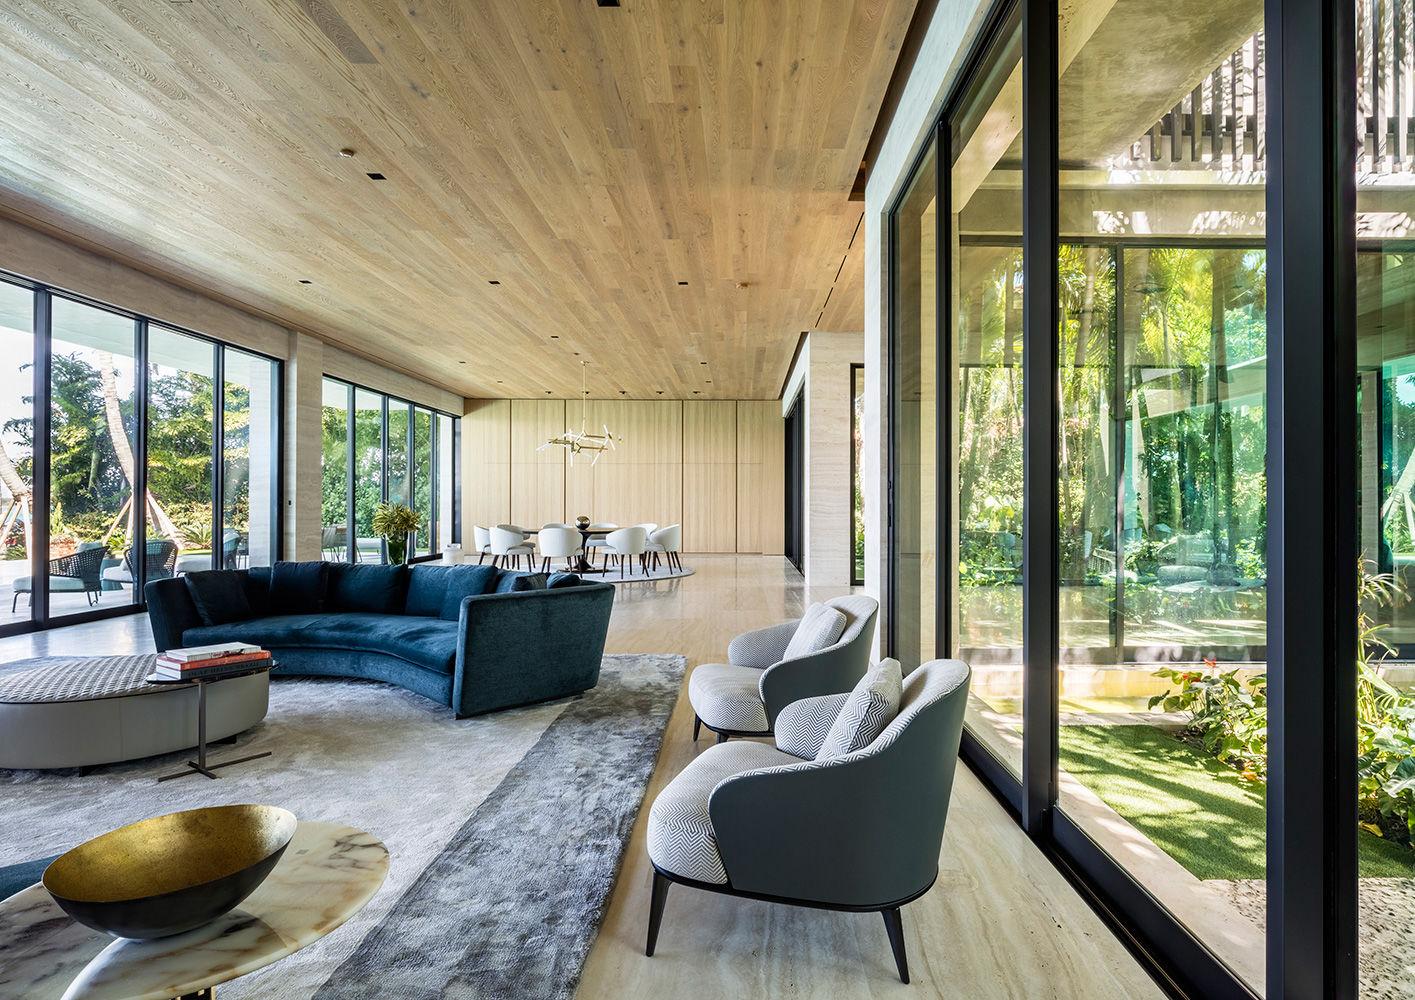 Miami bal harbour residence interiors contract en